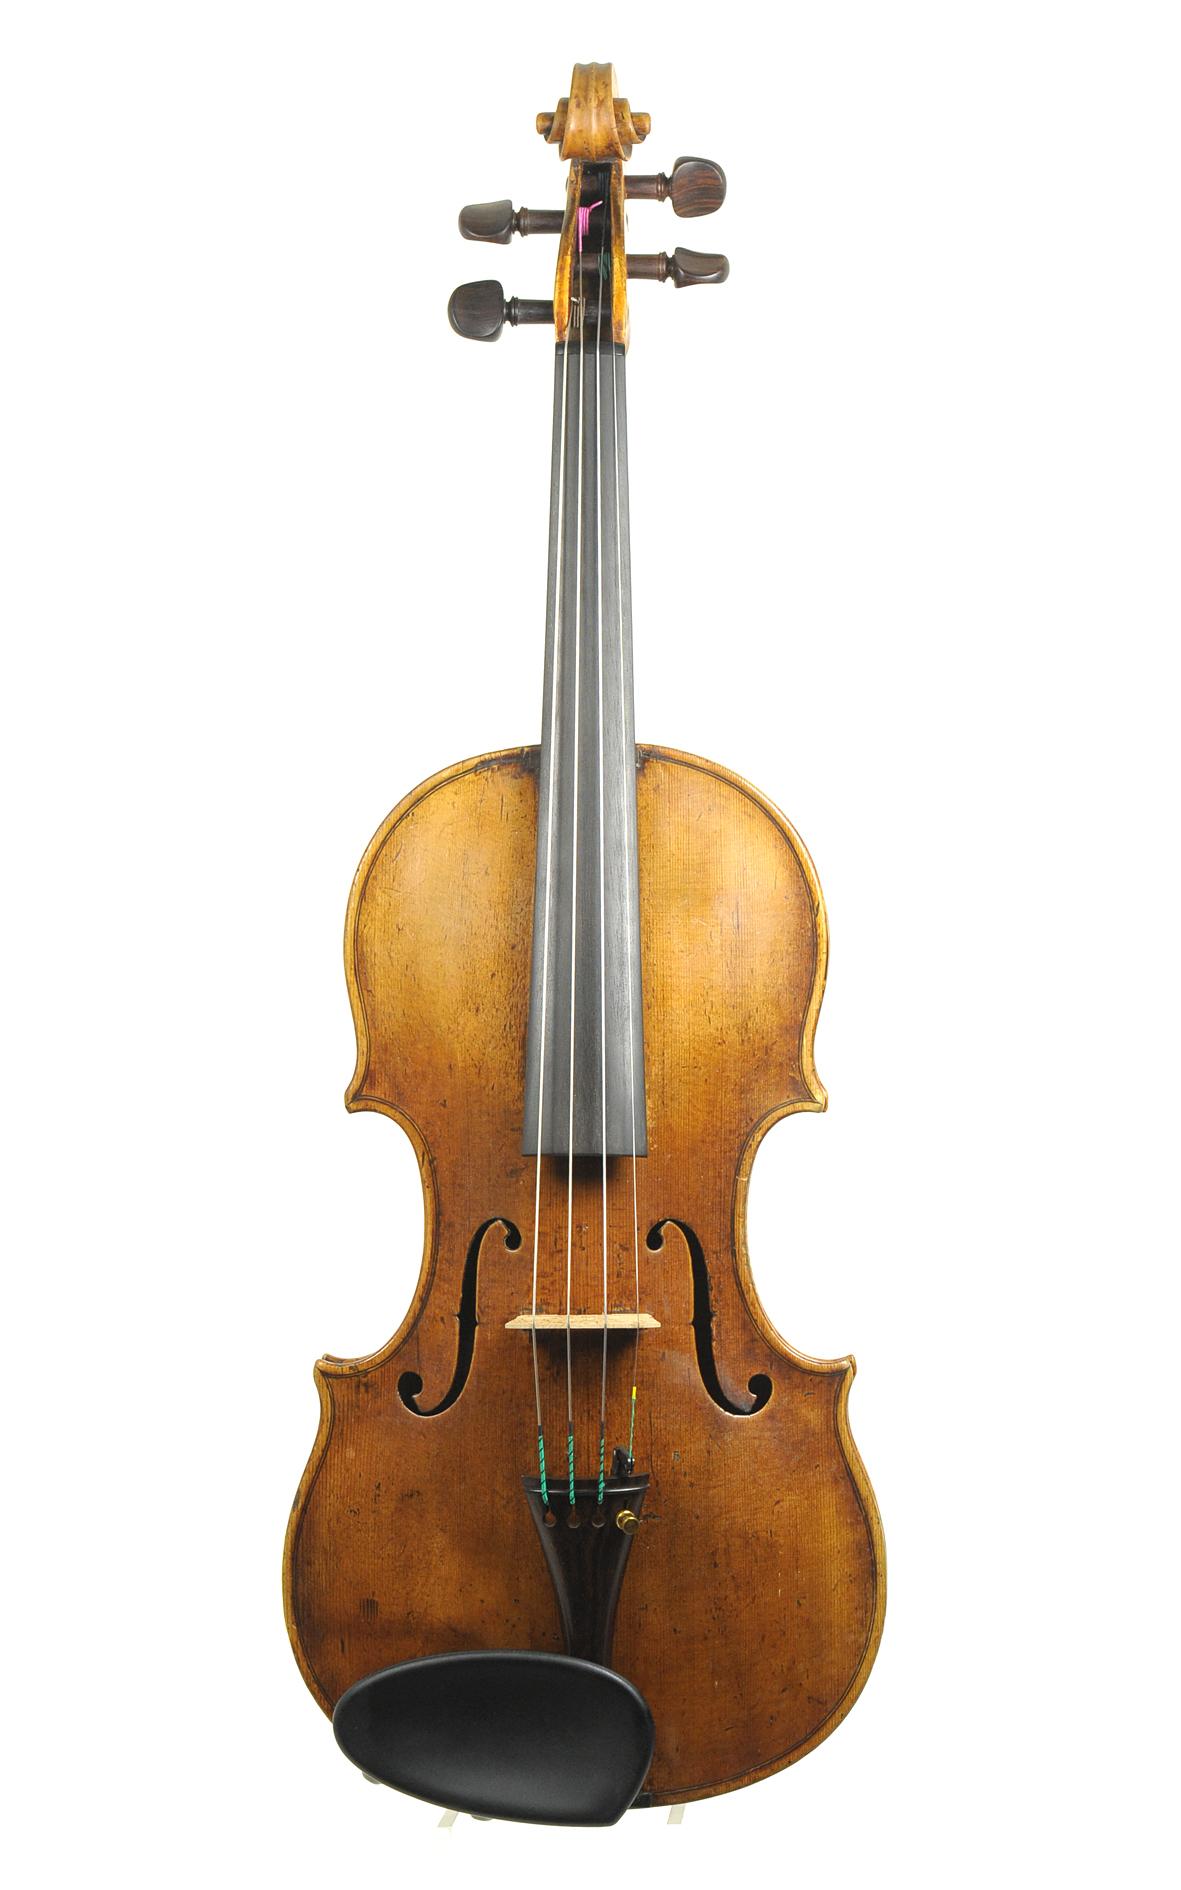 Violin by Georg Klotz